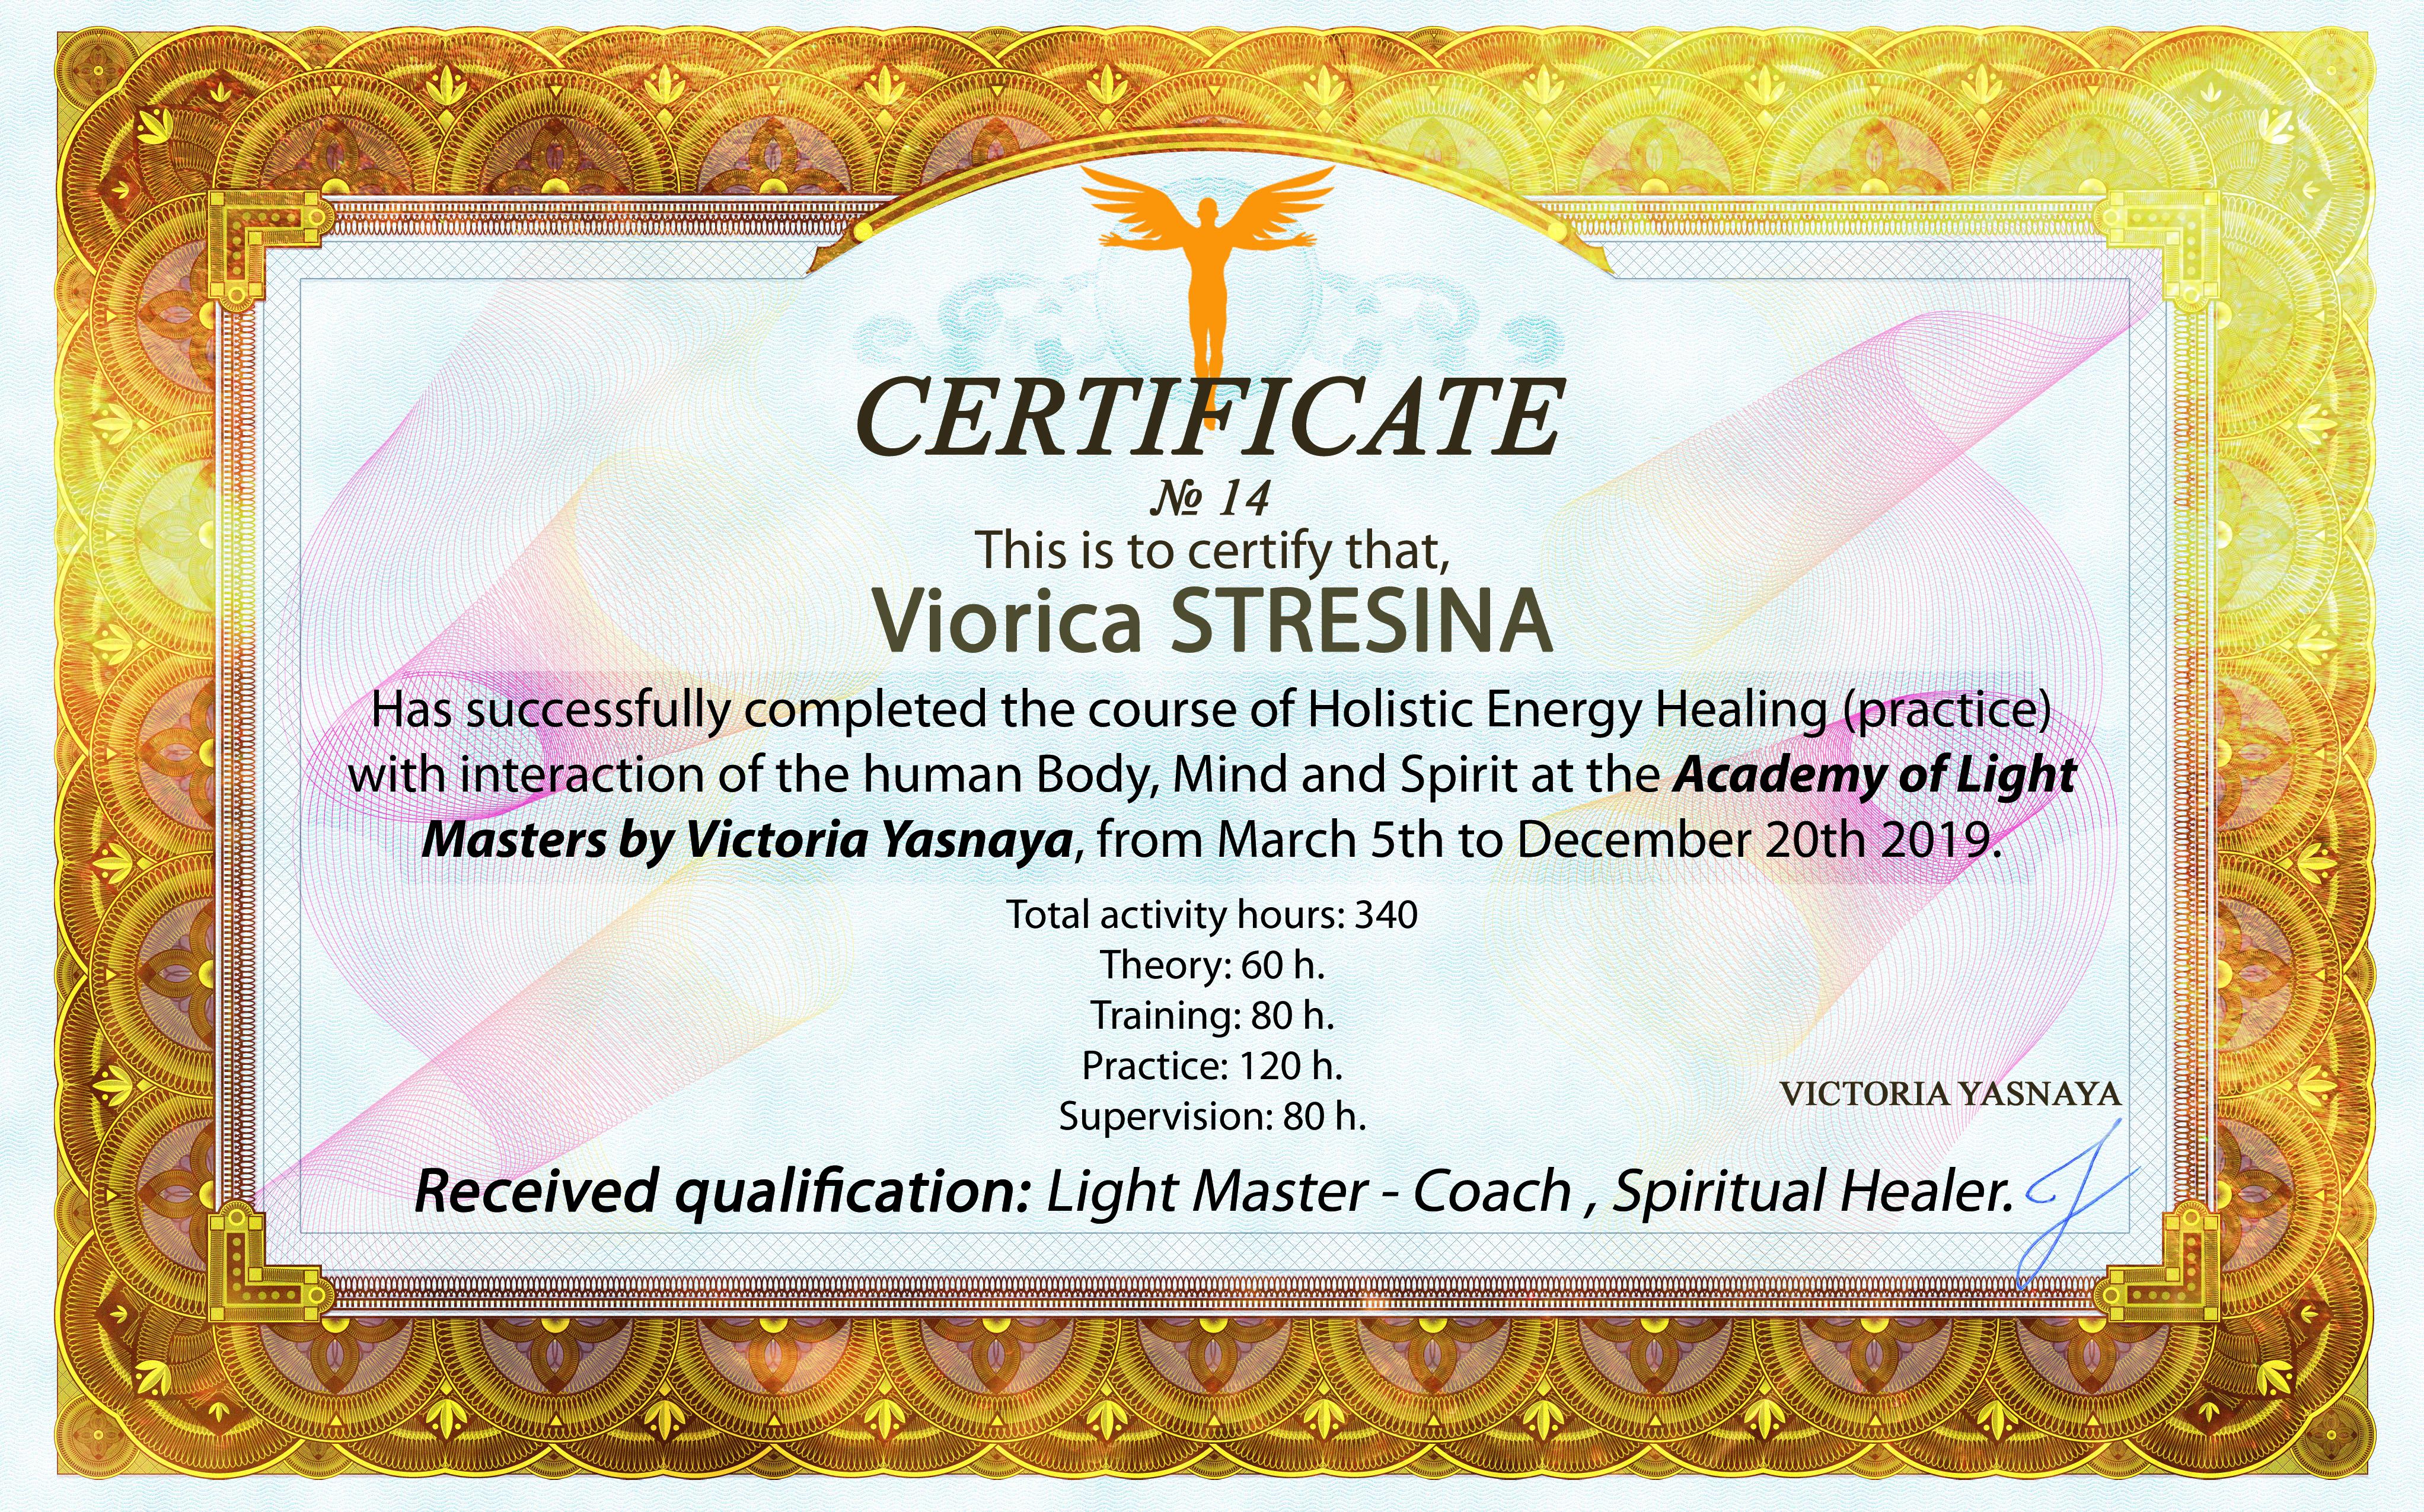 Сертификат_Viorica STRESINA_4_EN